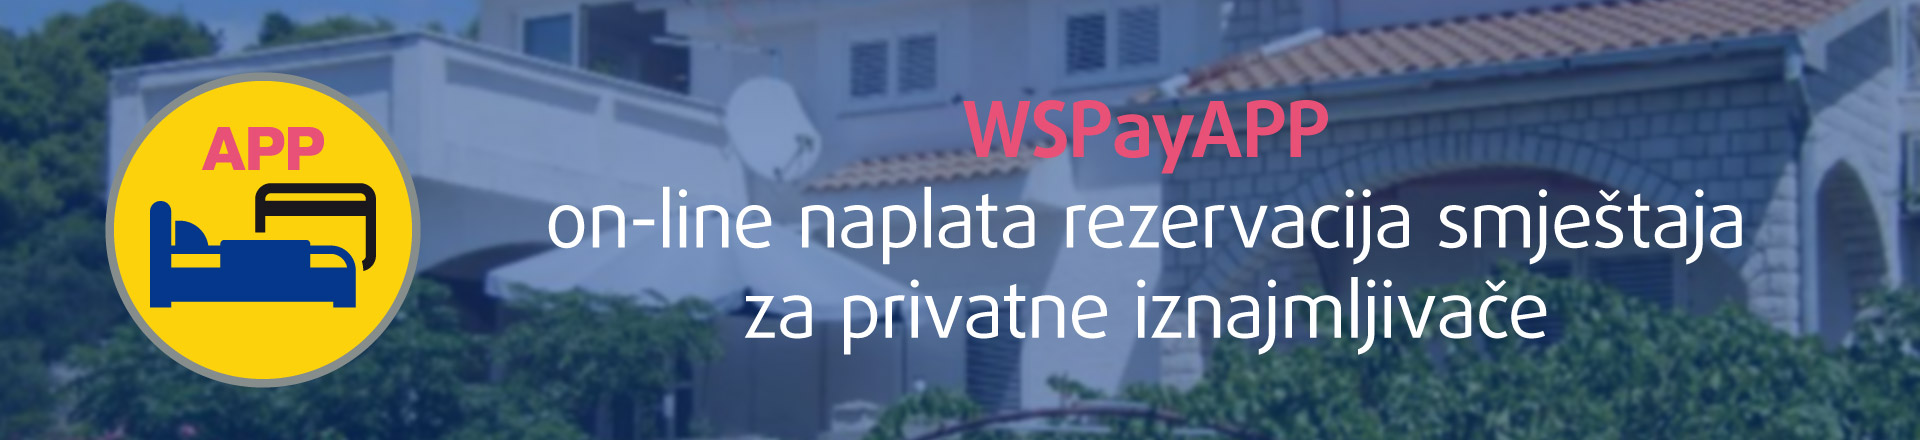 https://www.wspay.ba/Repository/Banners/WSPayAPP-1920x440.jpg